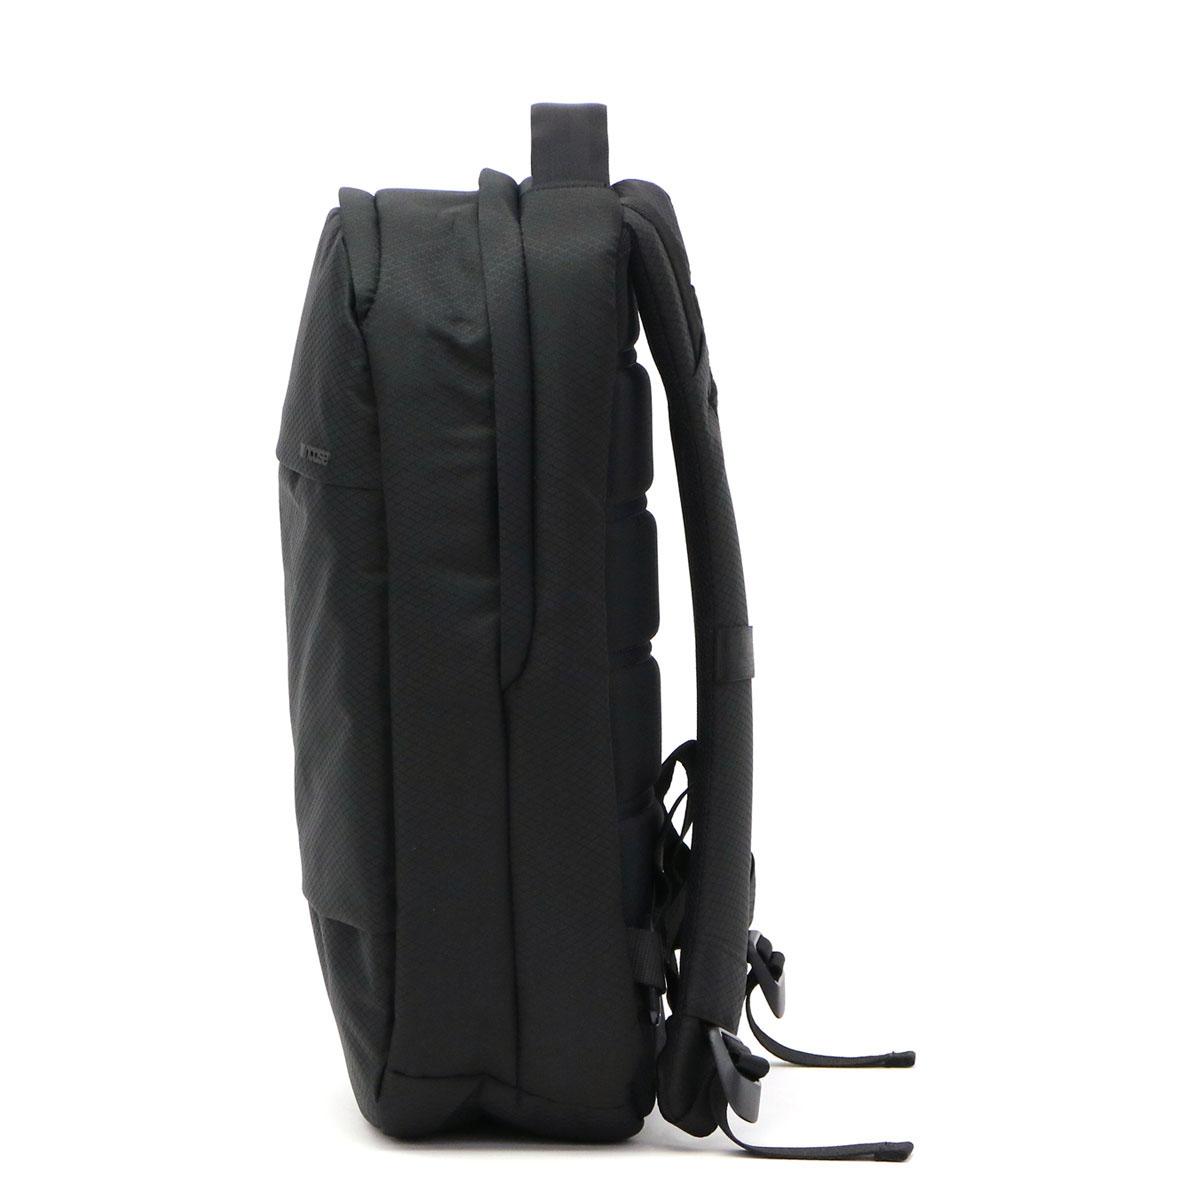 GALLERIA Bag-Luggage: Incase City Collection Compact